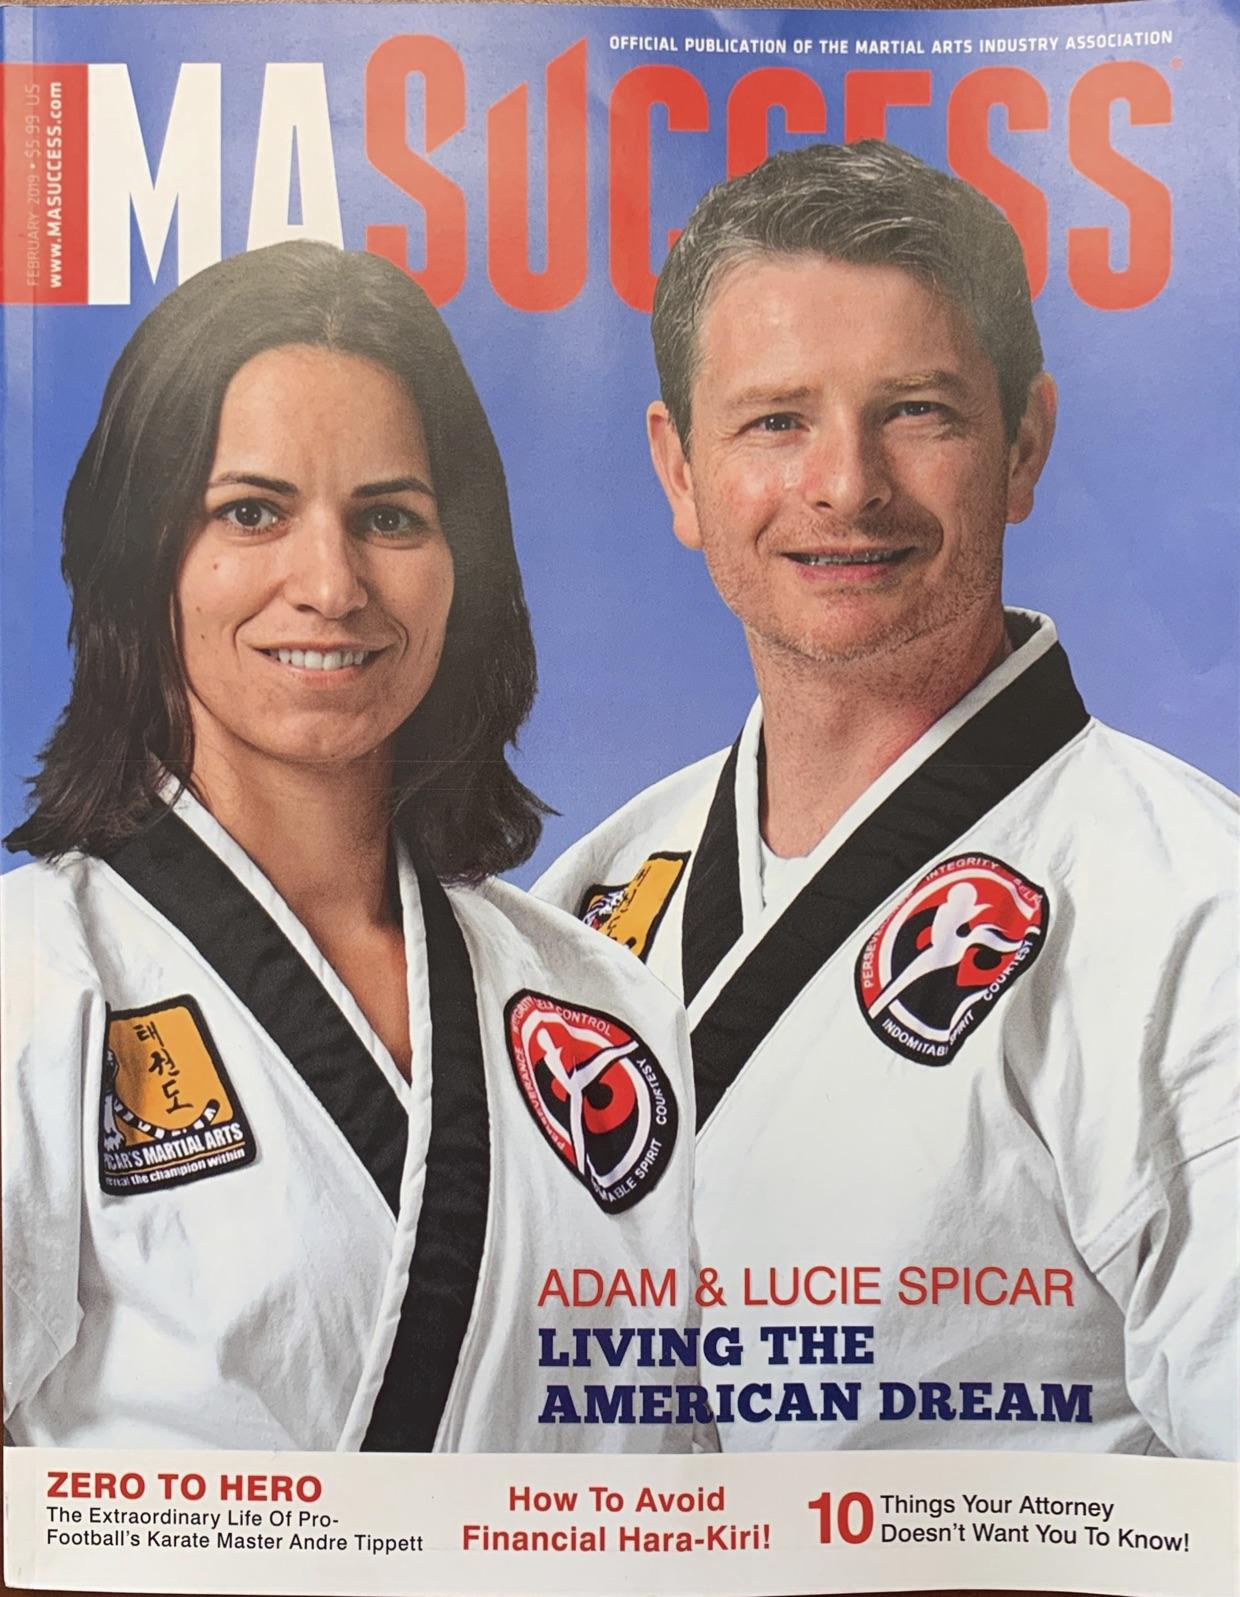 spicars-martial-arts-southlake-texas-national-award-recognition.jpg